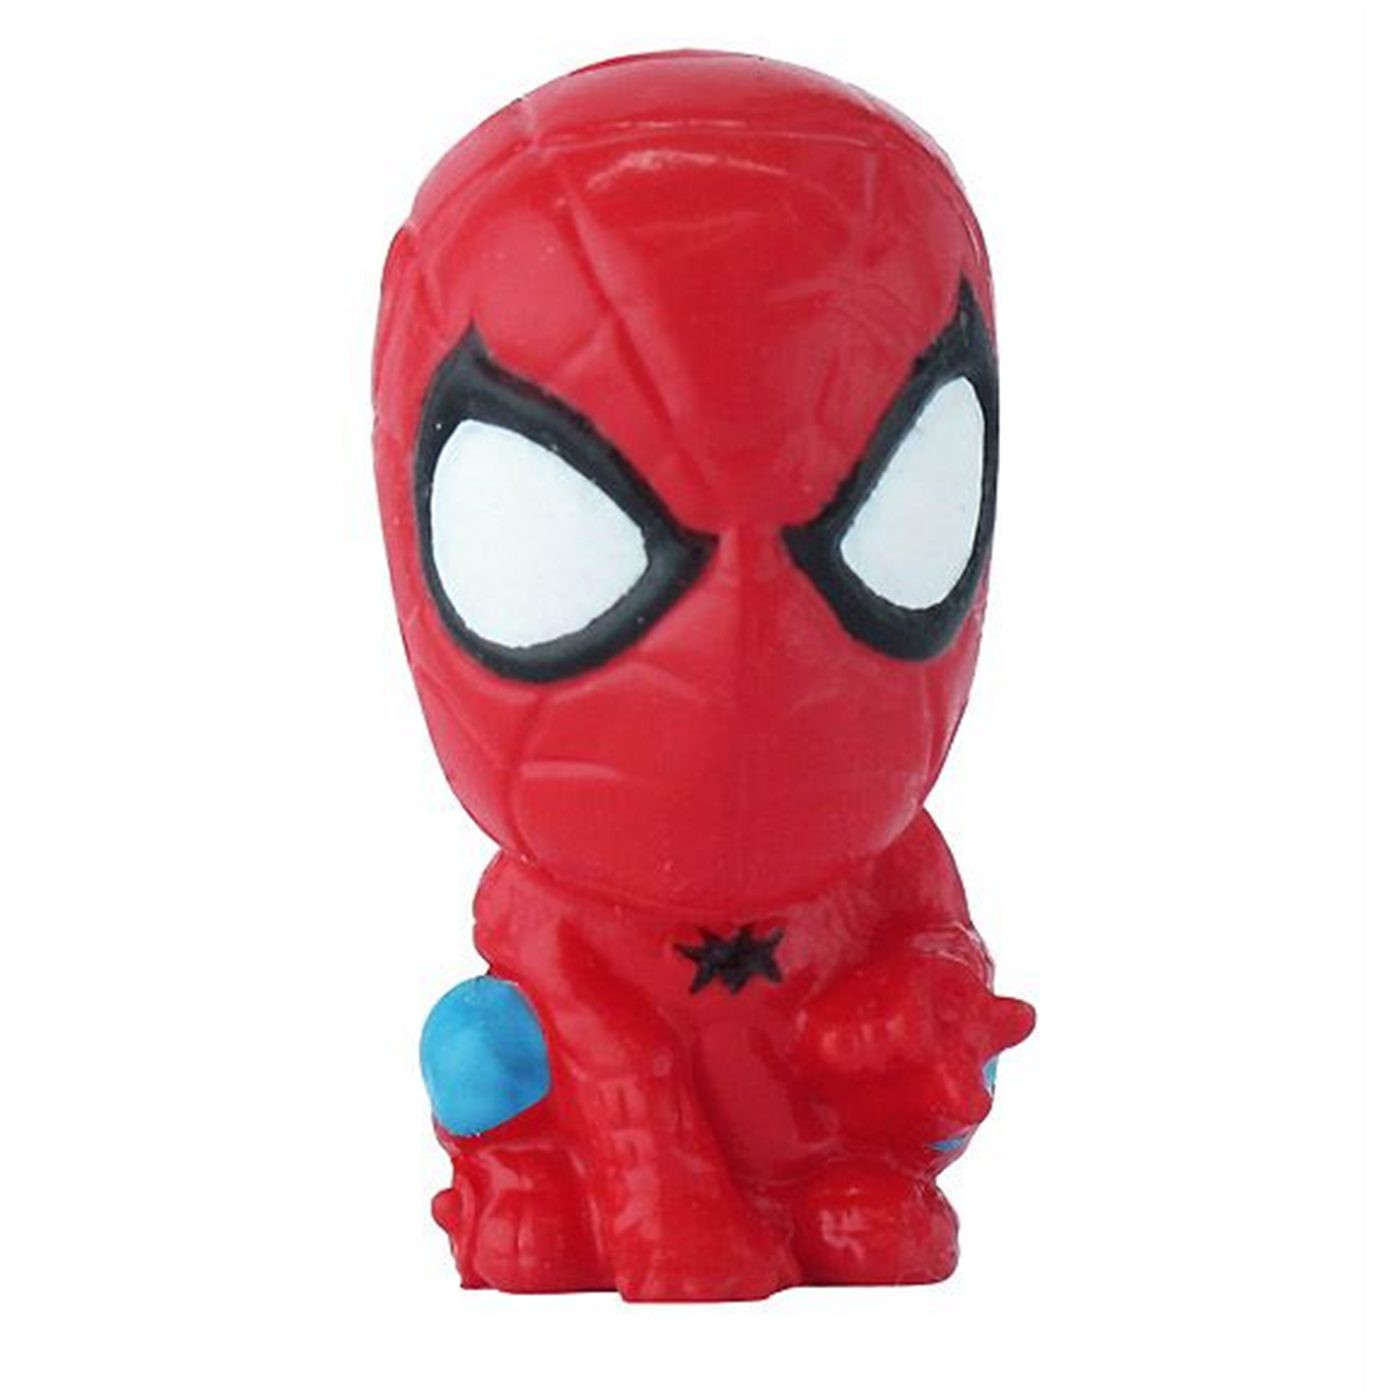 Spiderman Deformed Pencil Eraser